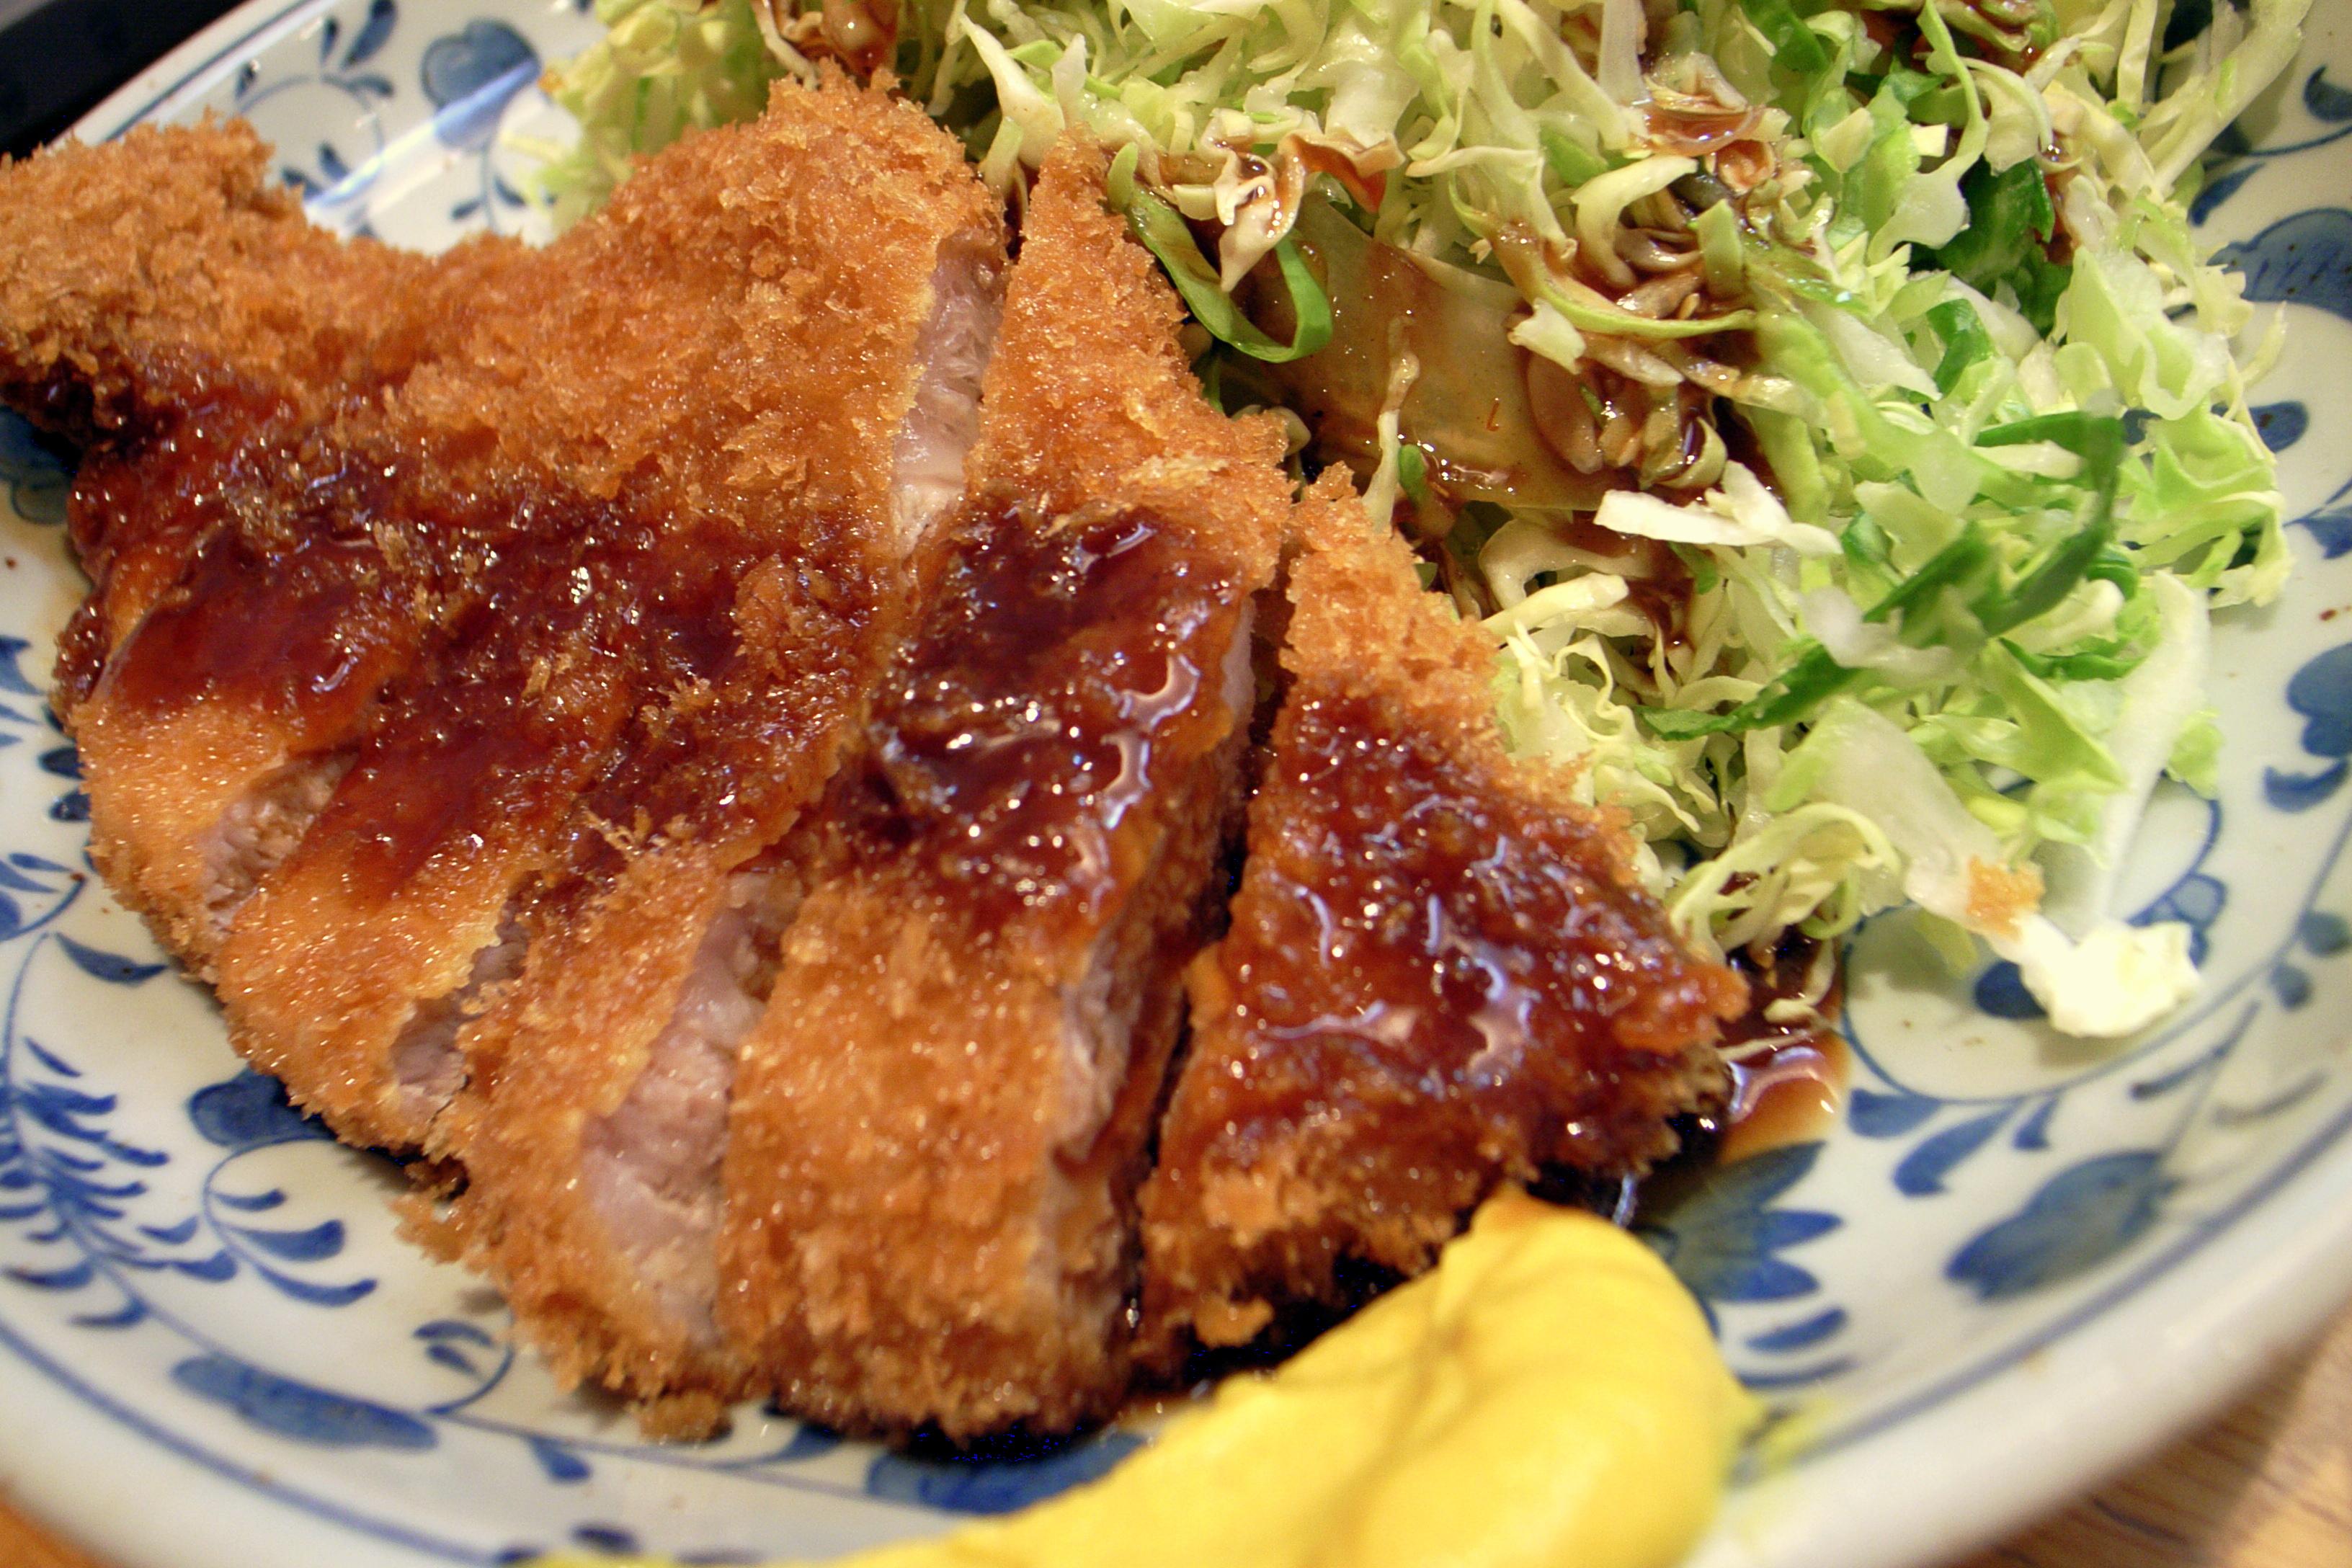 File:Tonkatsu by yoppy in Shibuya, Tokyo.jpg - Wikimedia Commons